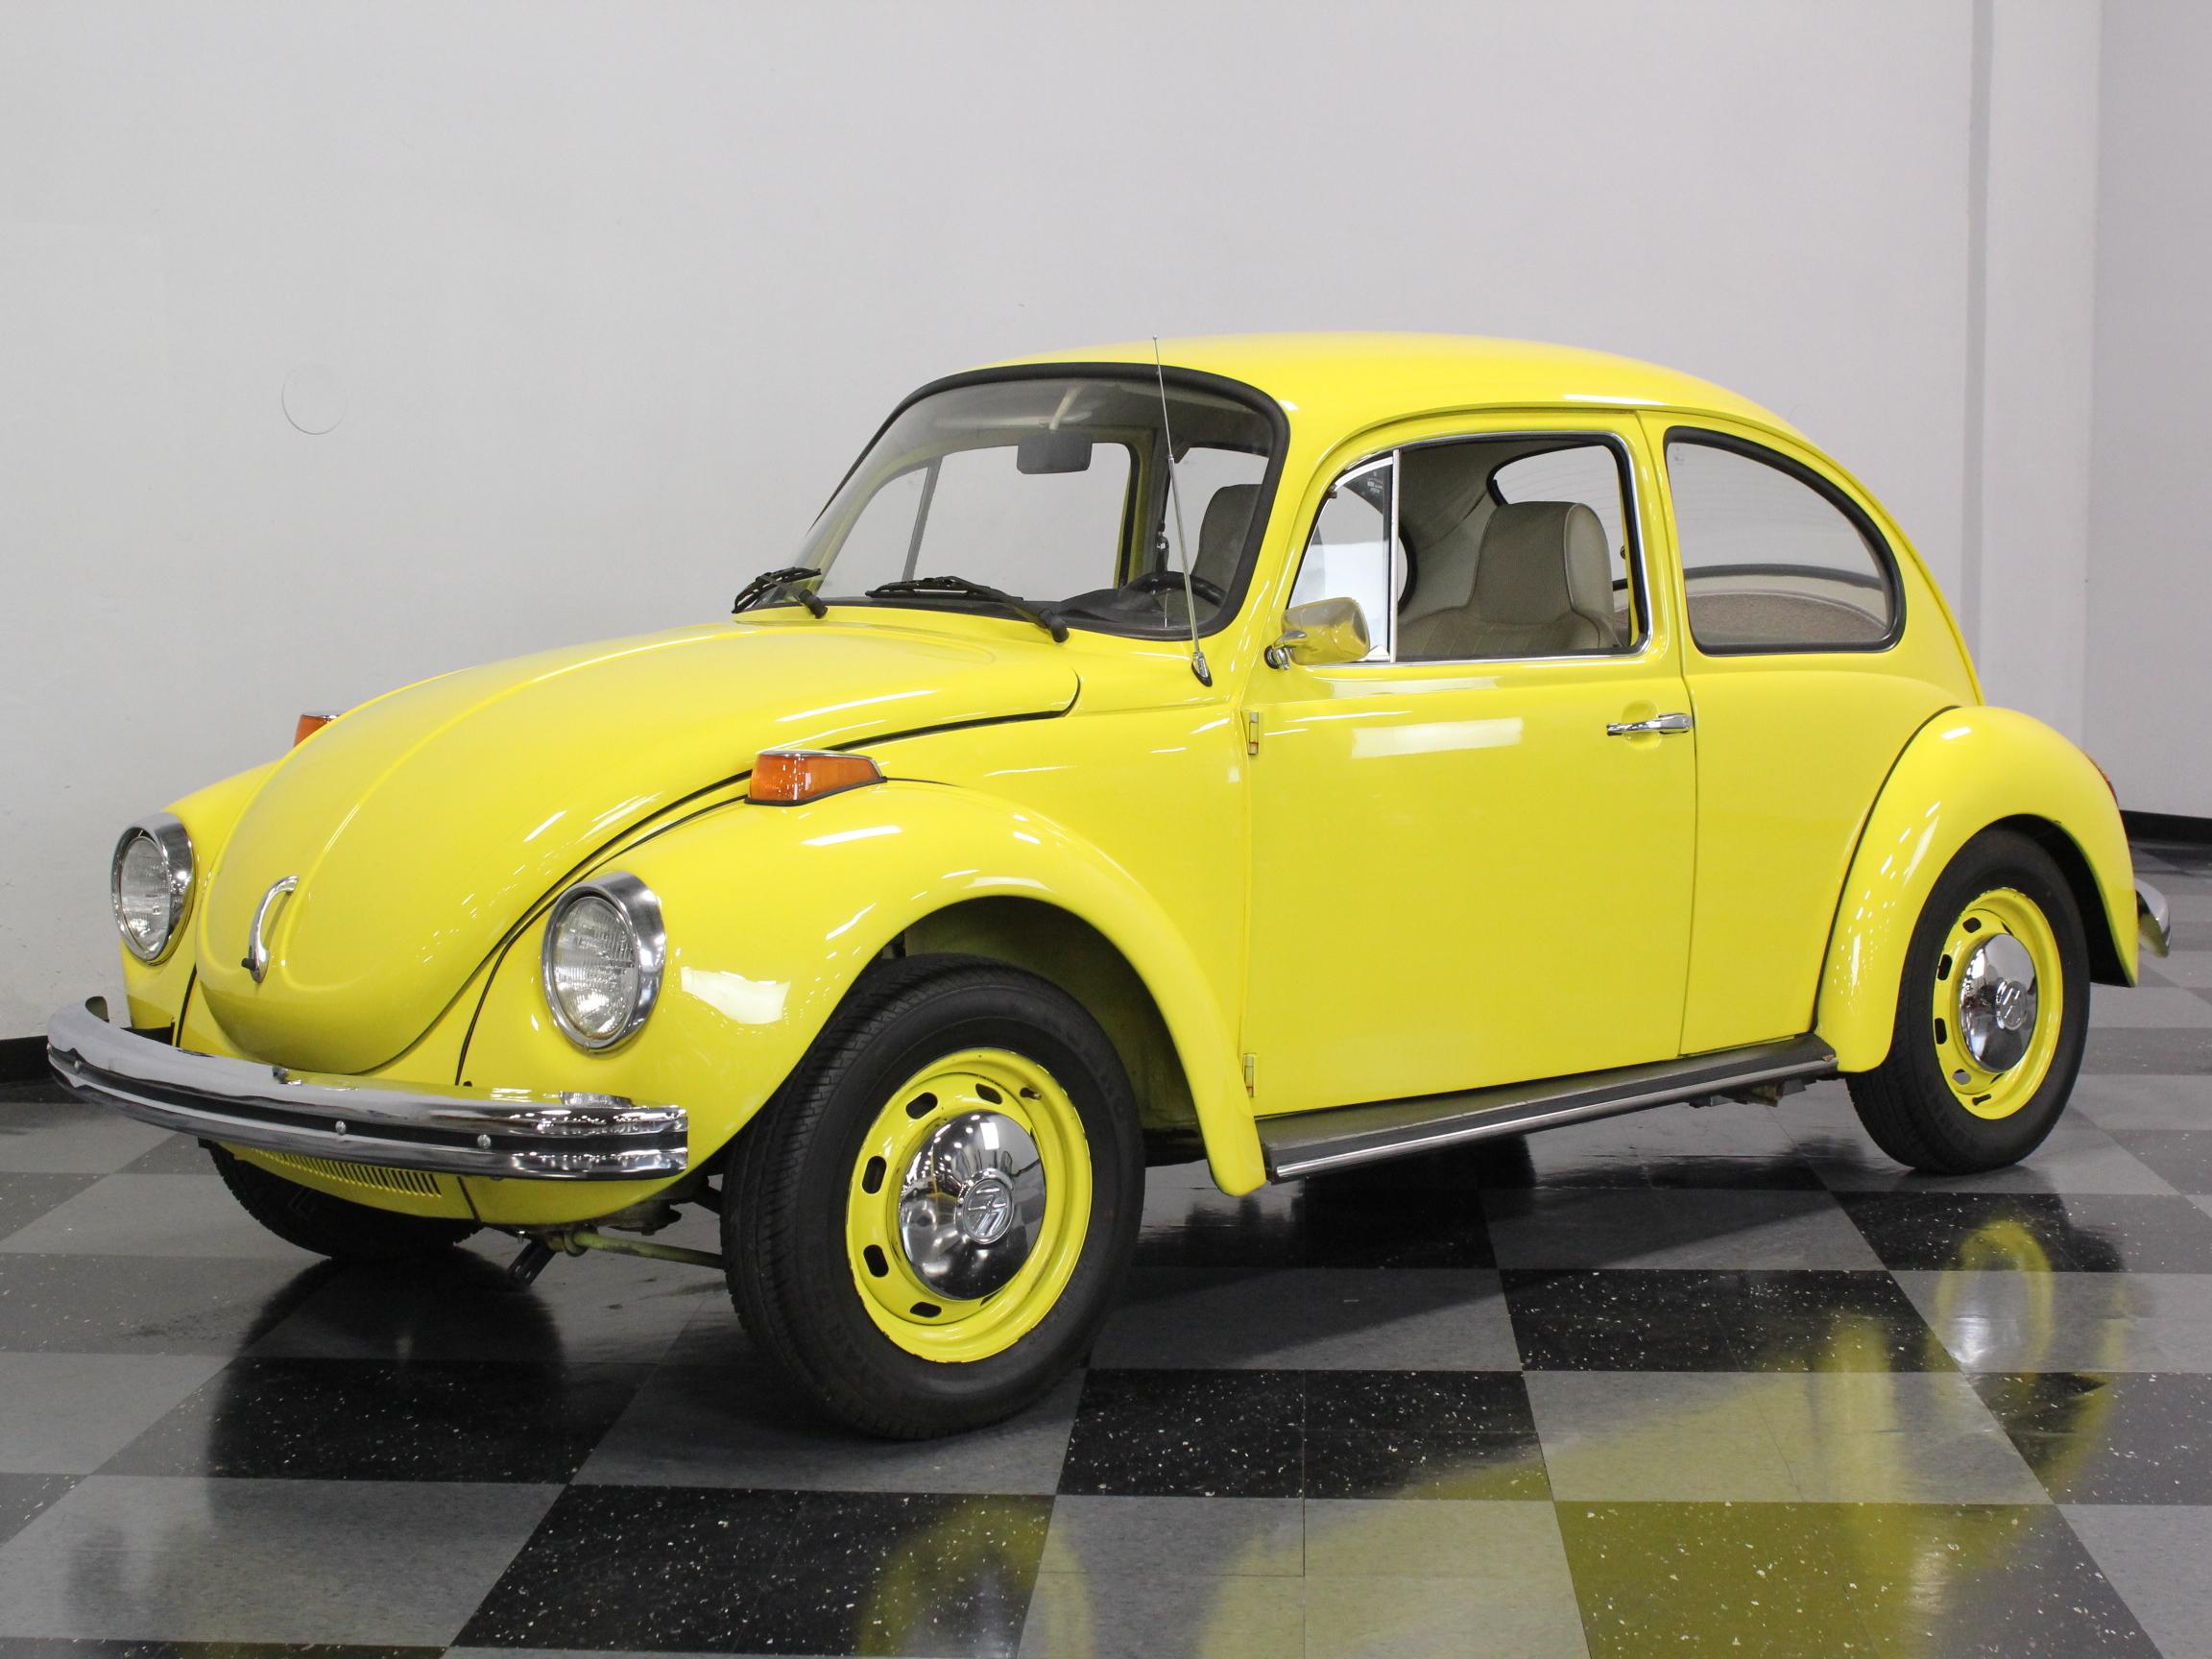 73 Volkswagen Super Beetle1974 Vw Beetle Engine Wiring Diagram 1978 1973 Streetside Classics